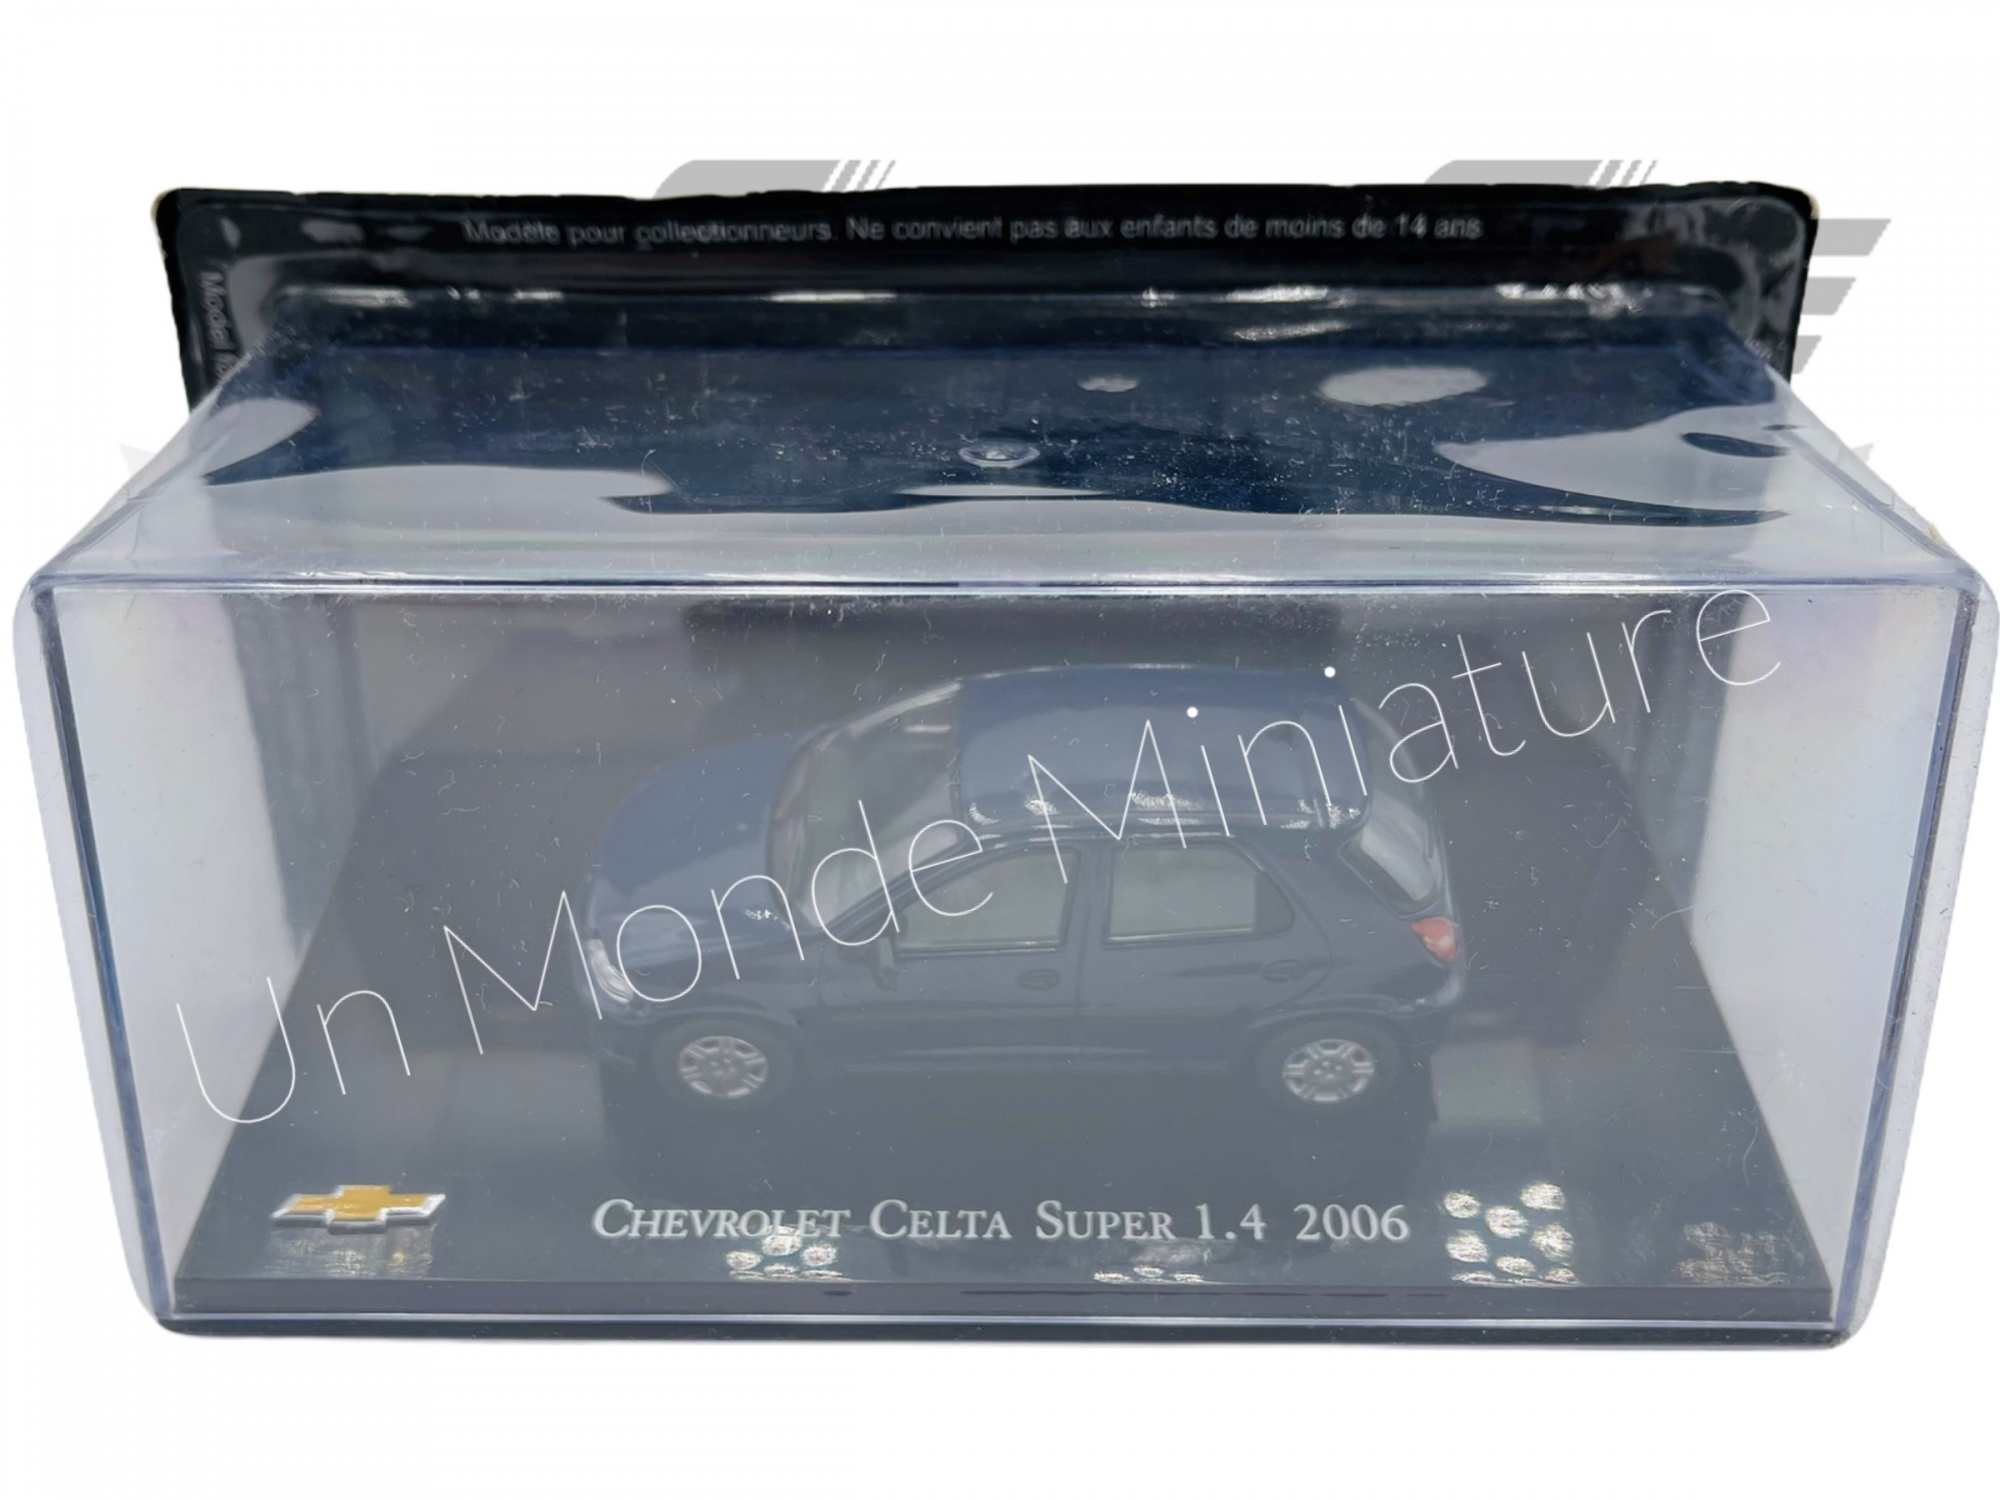 Chevrolet Celta Super 1,4 2006